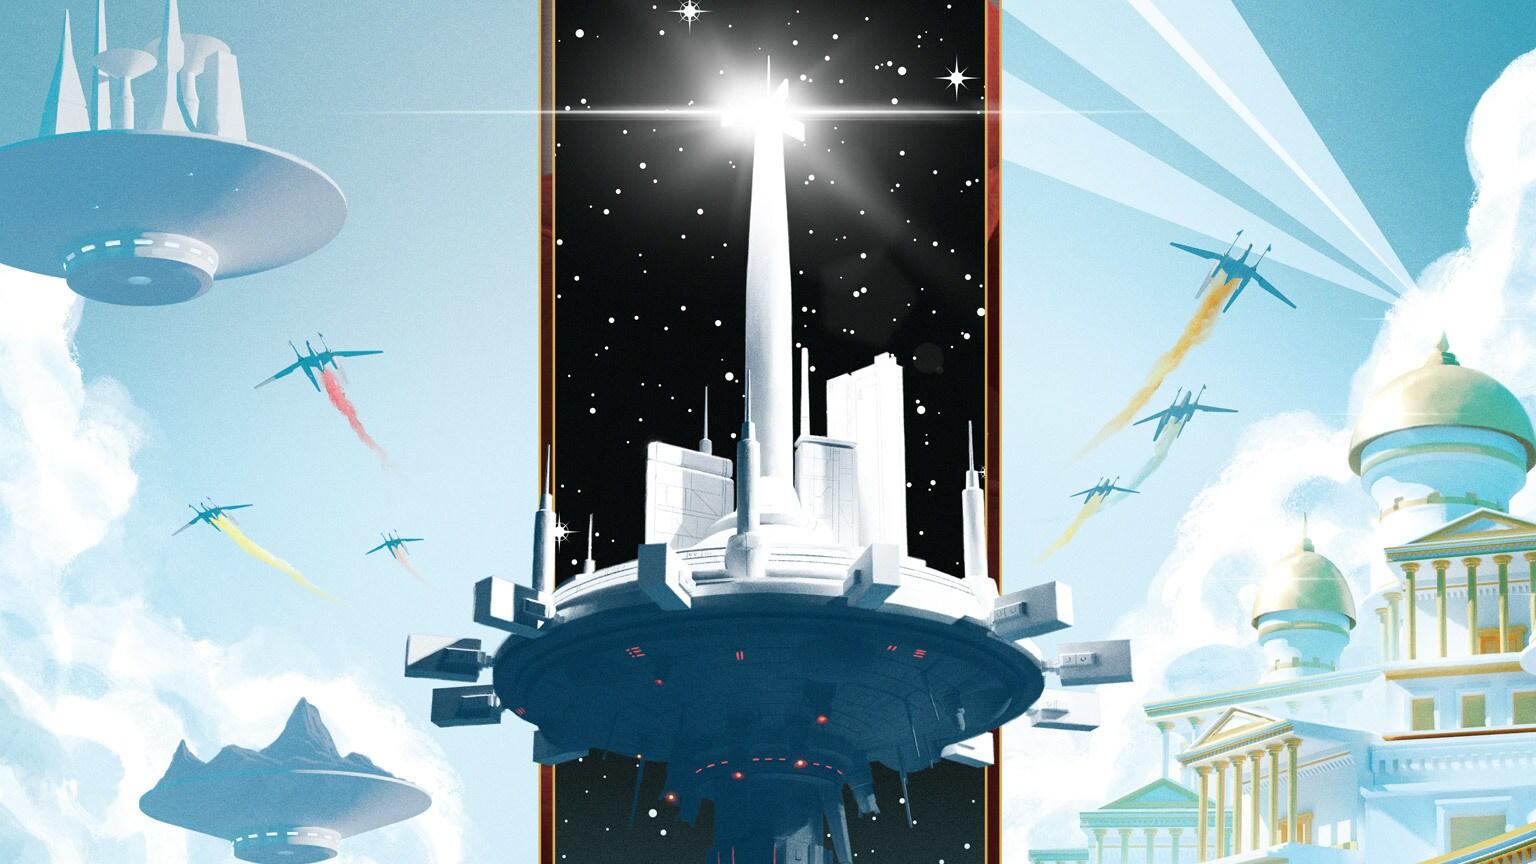 The Republic Fair poster art